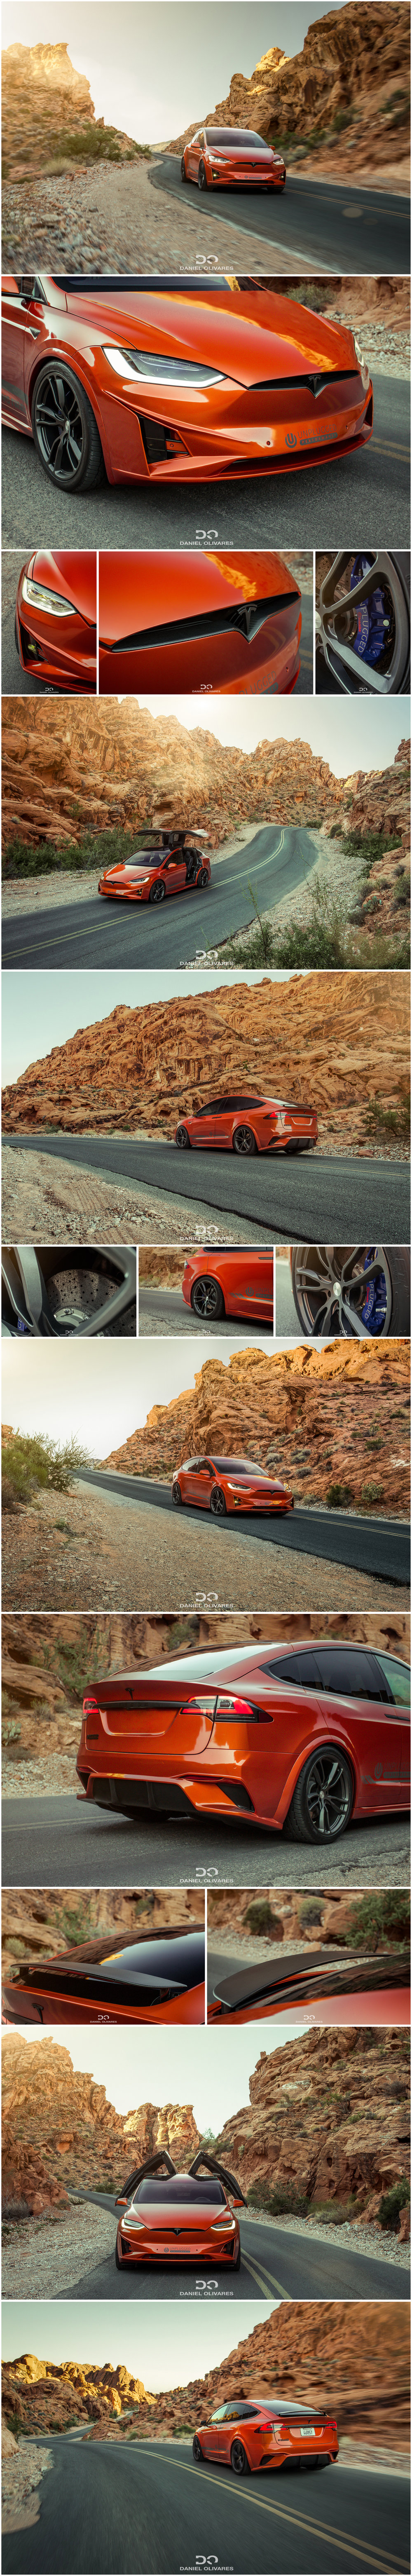 Model X Collage.jpg